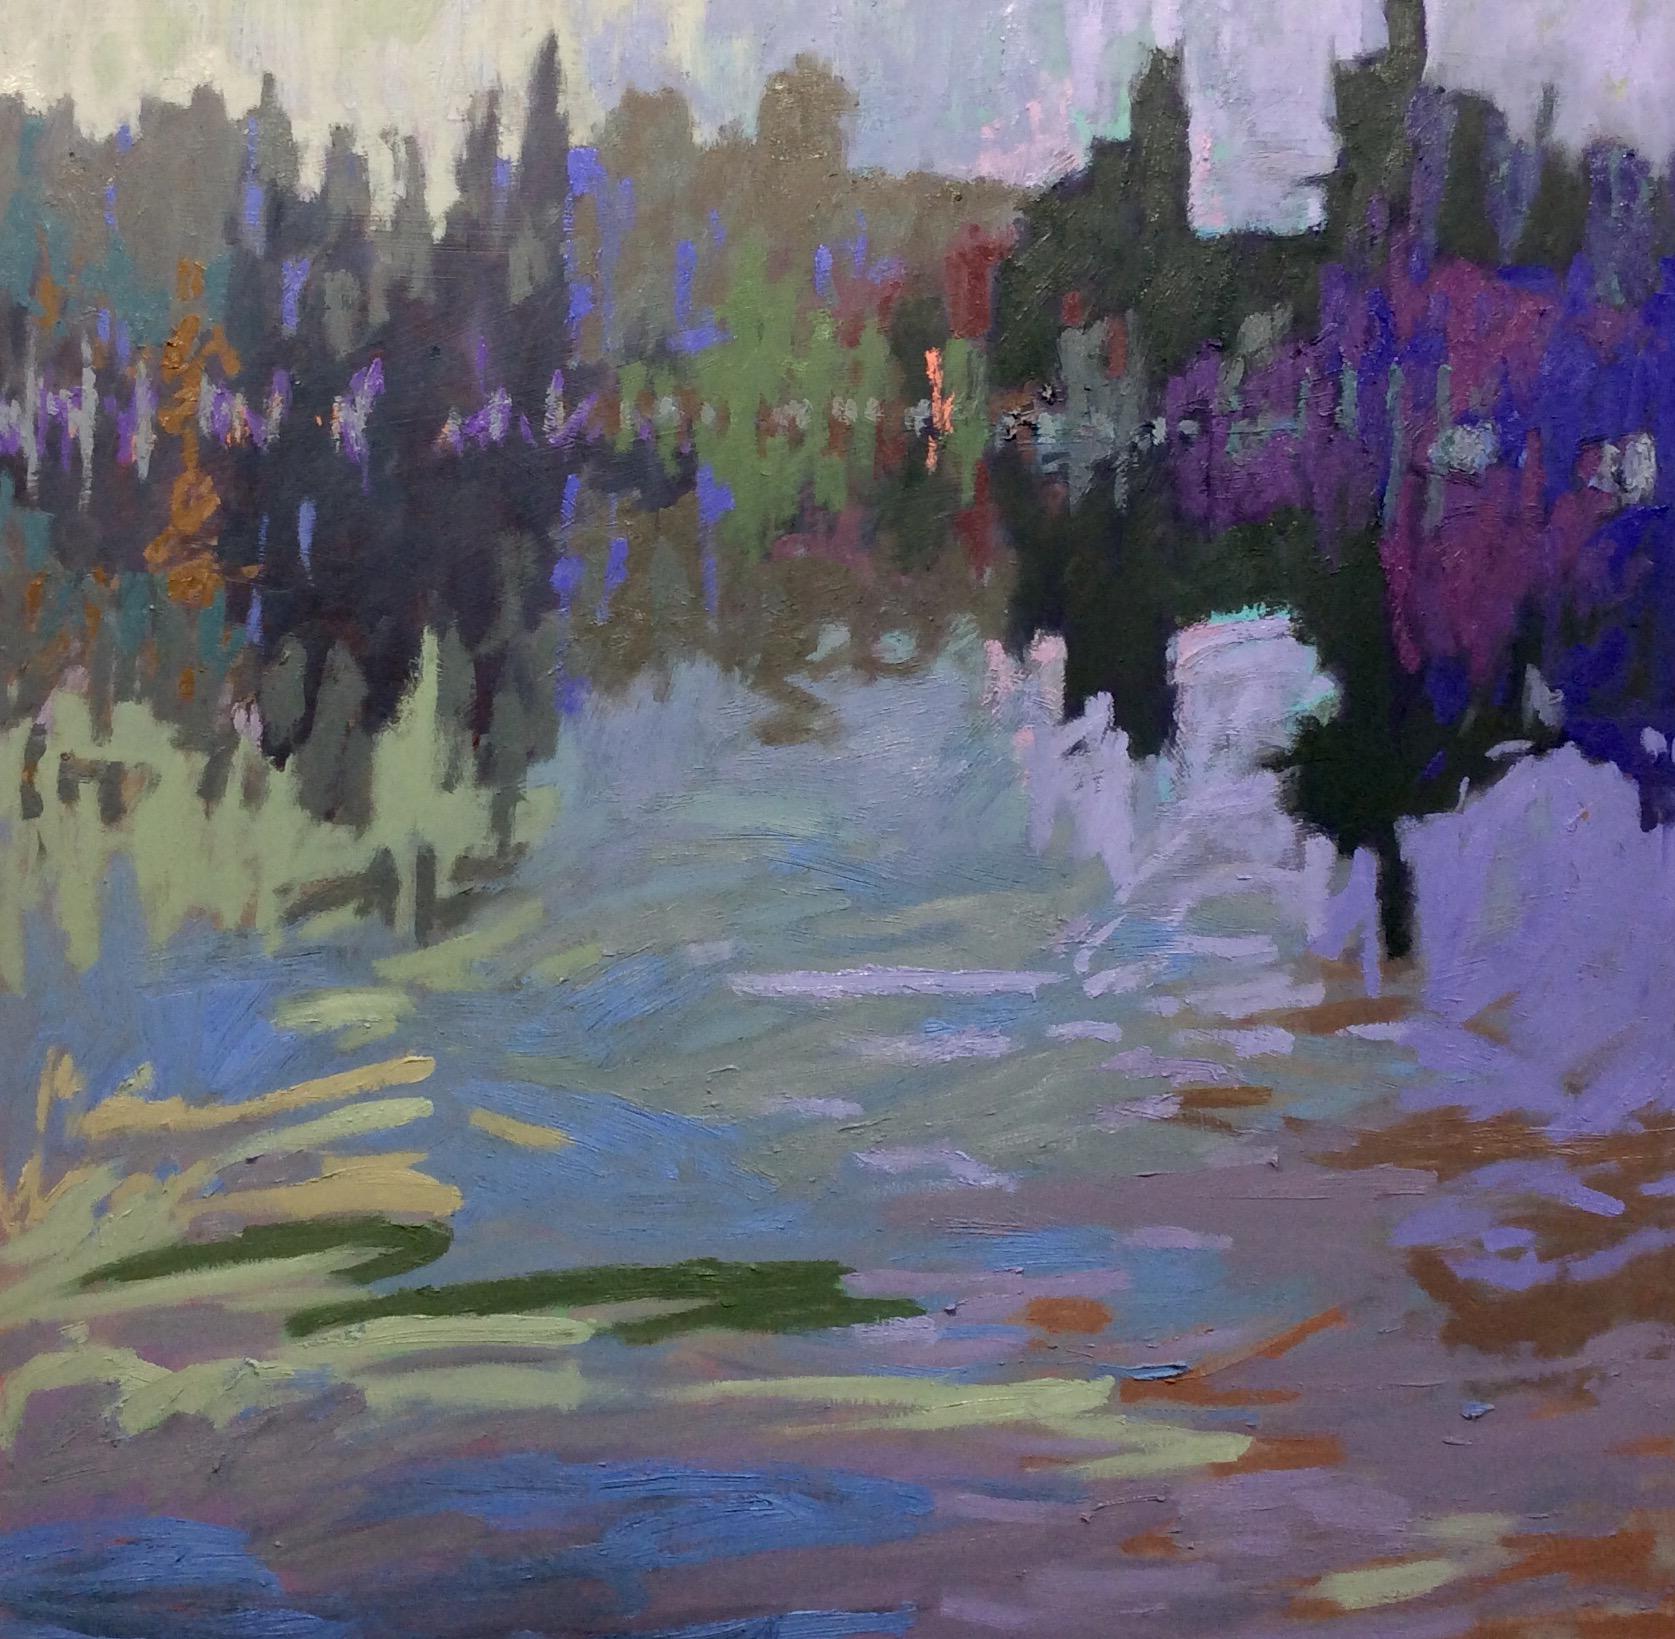 Jane Schmidt DEEP REFLECTIONS 36 x 36 oil on wood.jpg